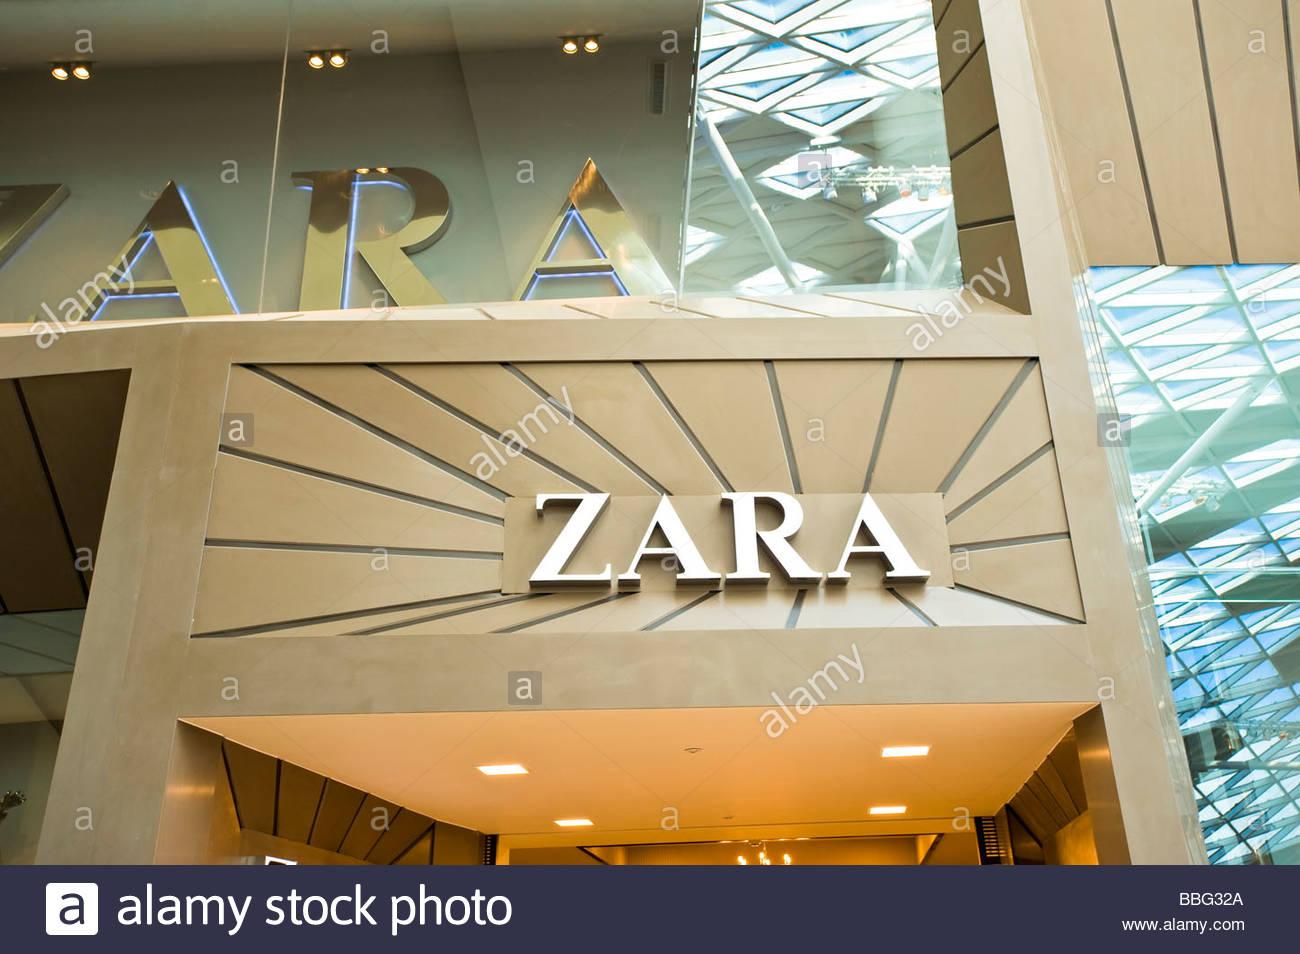 Zara, Westfield Shopping Centre, White City Development - Stock Image